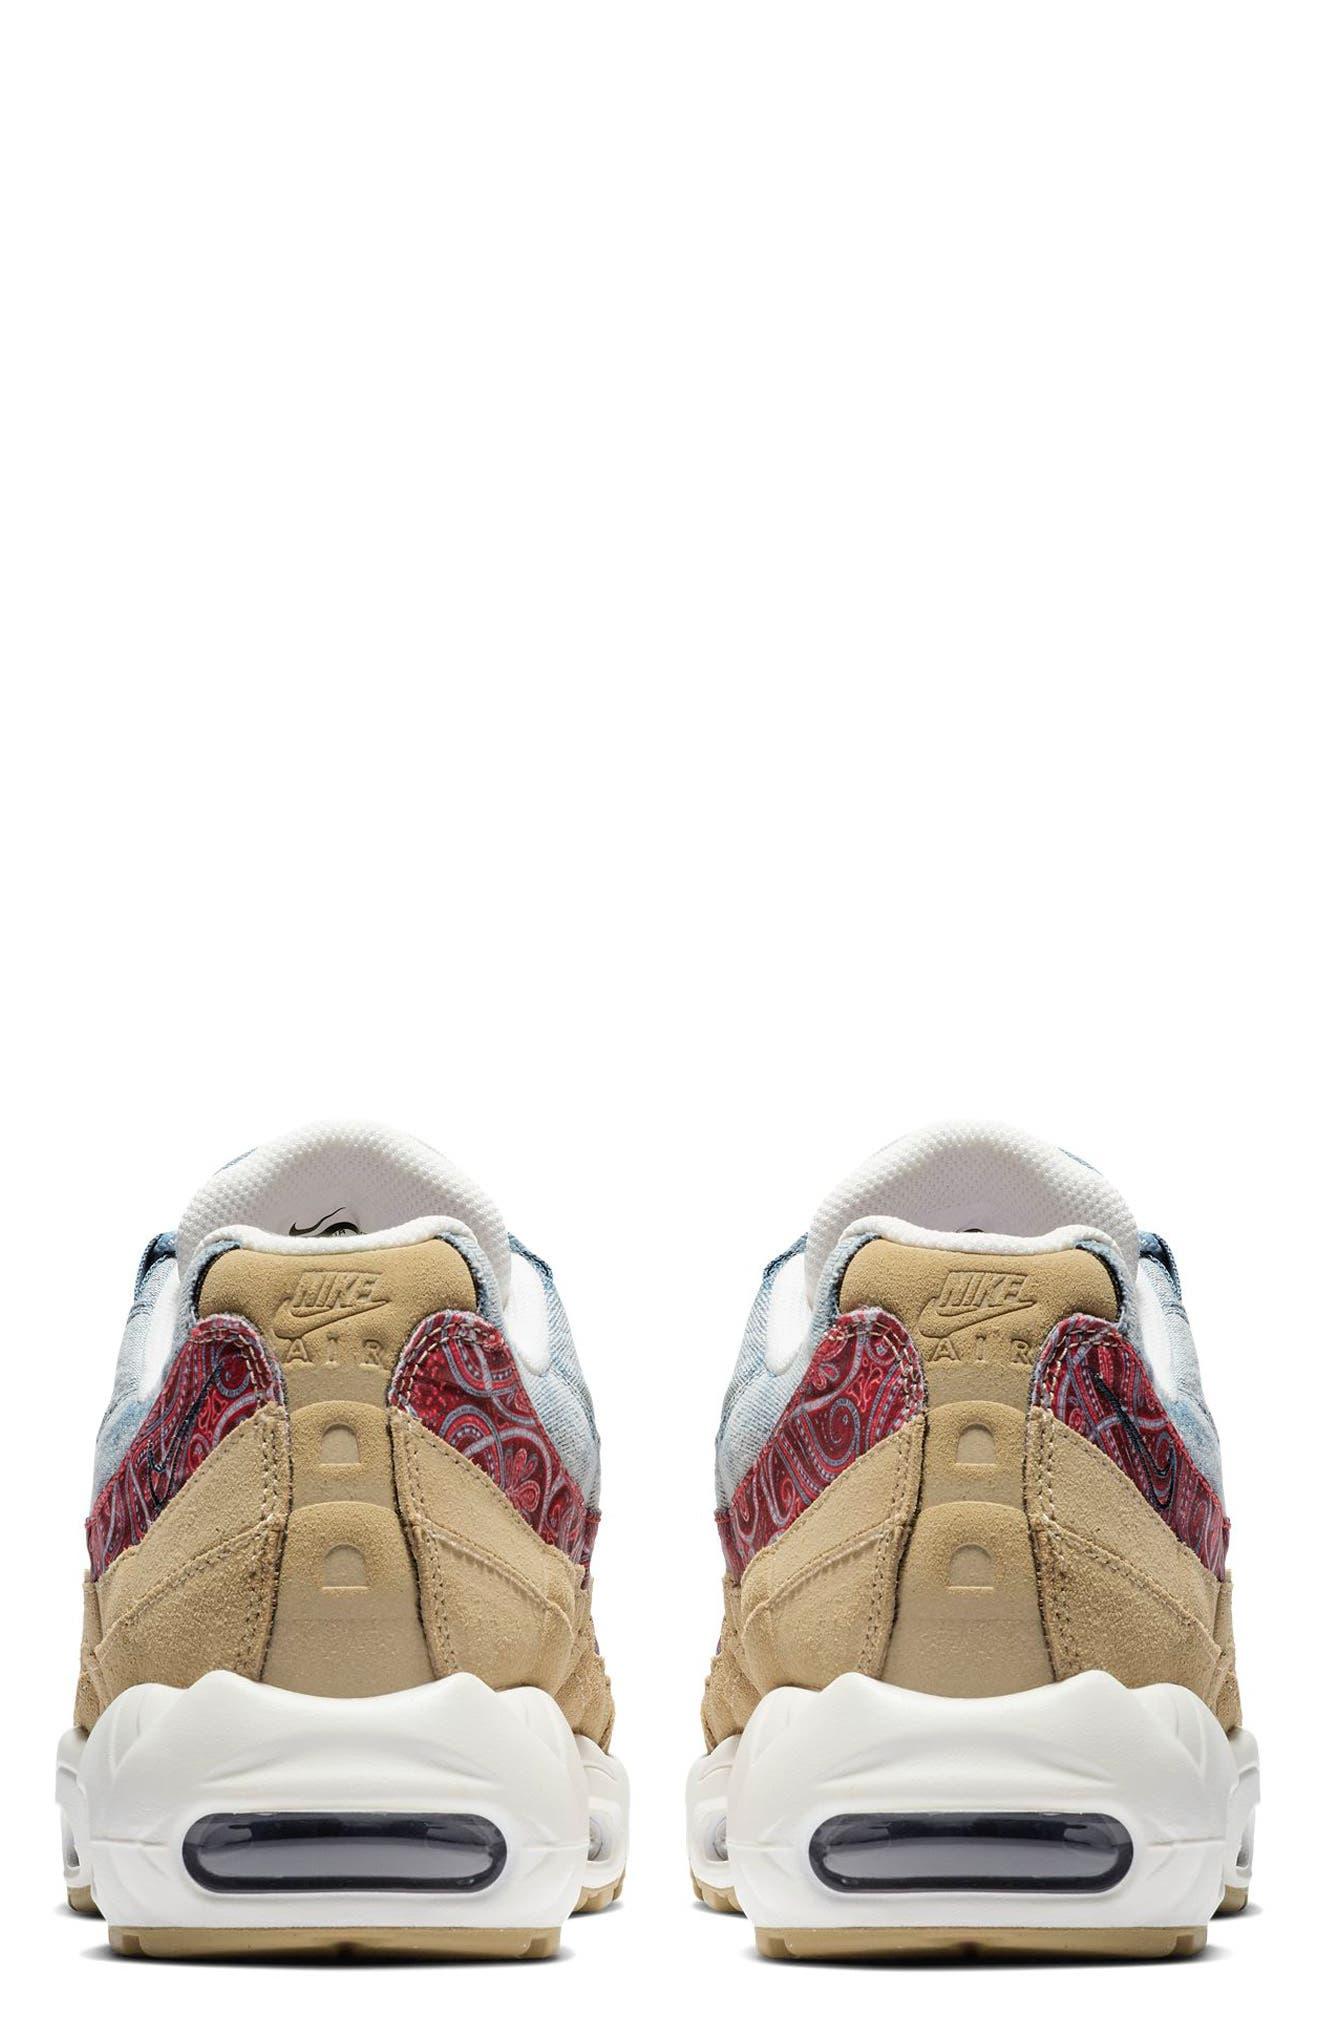 Air Max 95 Sneaker,                             Alternate thumbnail 2, color,                             PARACHUTE BEIGE/ RED